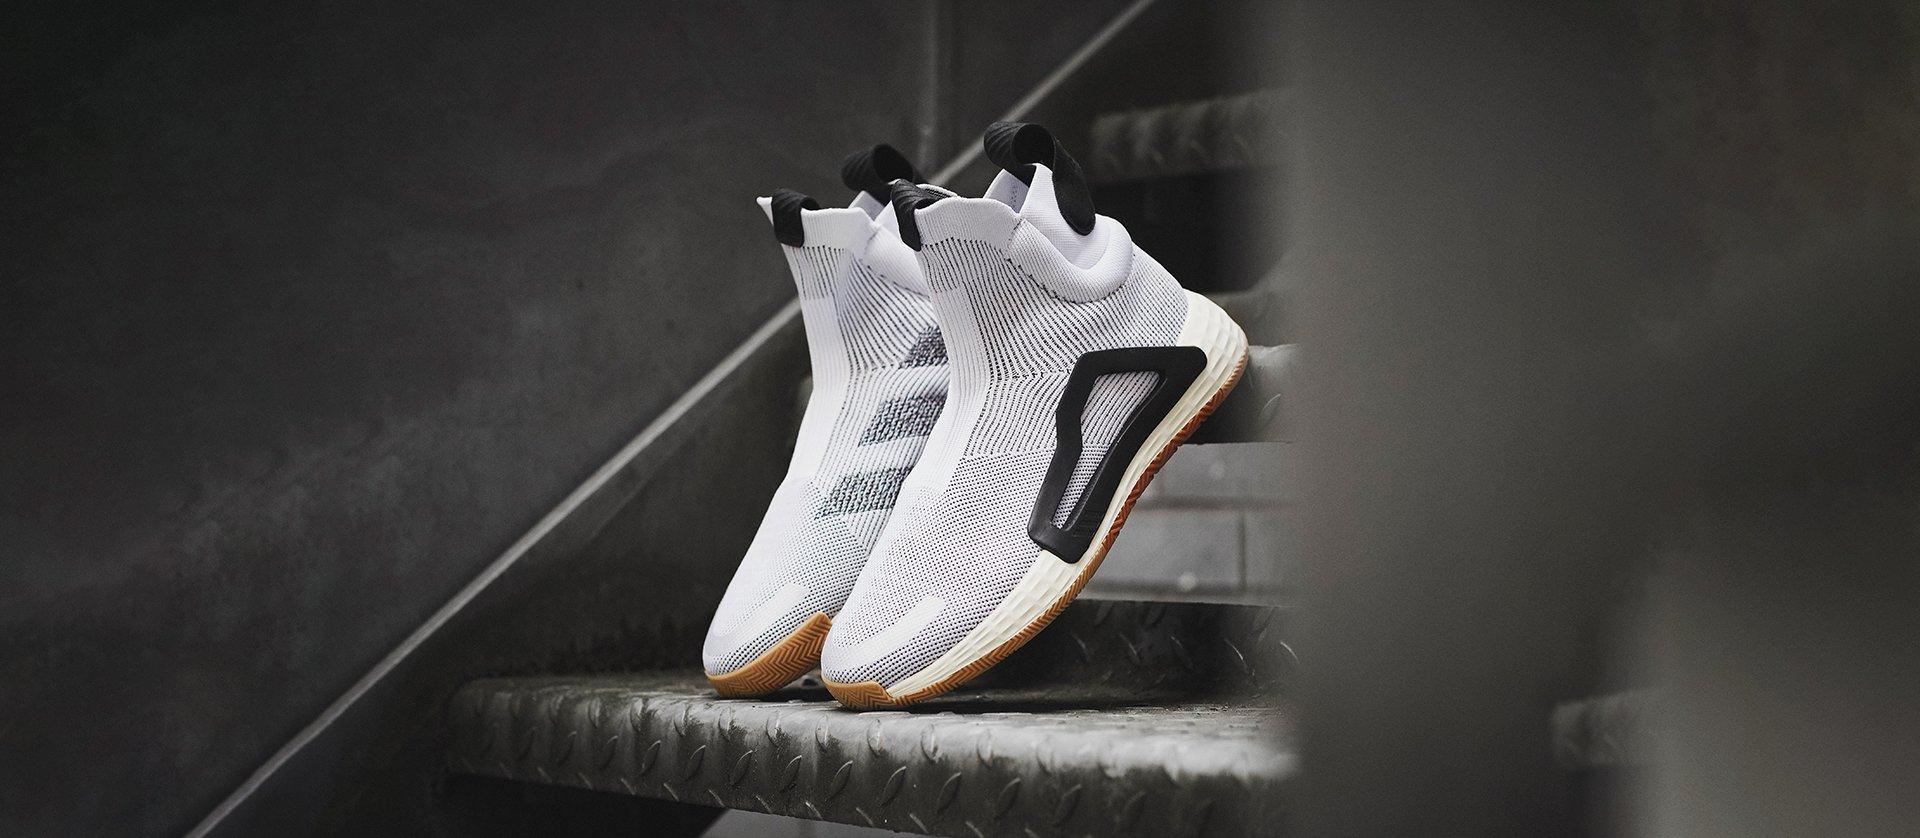 Footpatrol - Latest Premium Footwear 93587d116